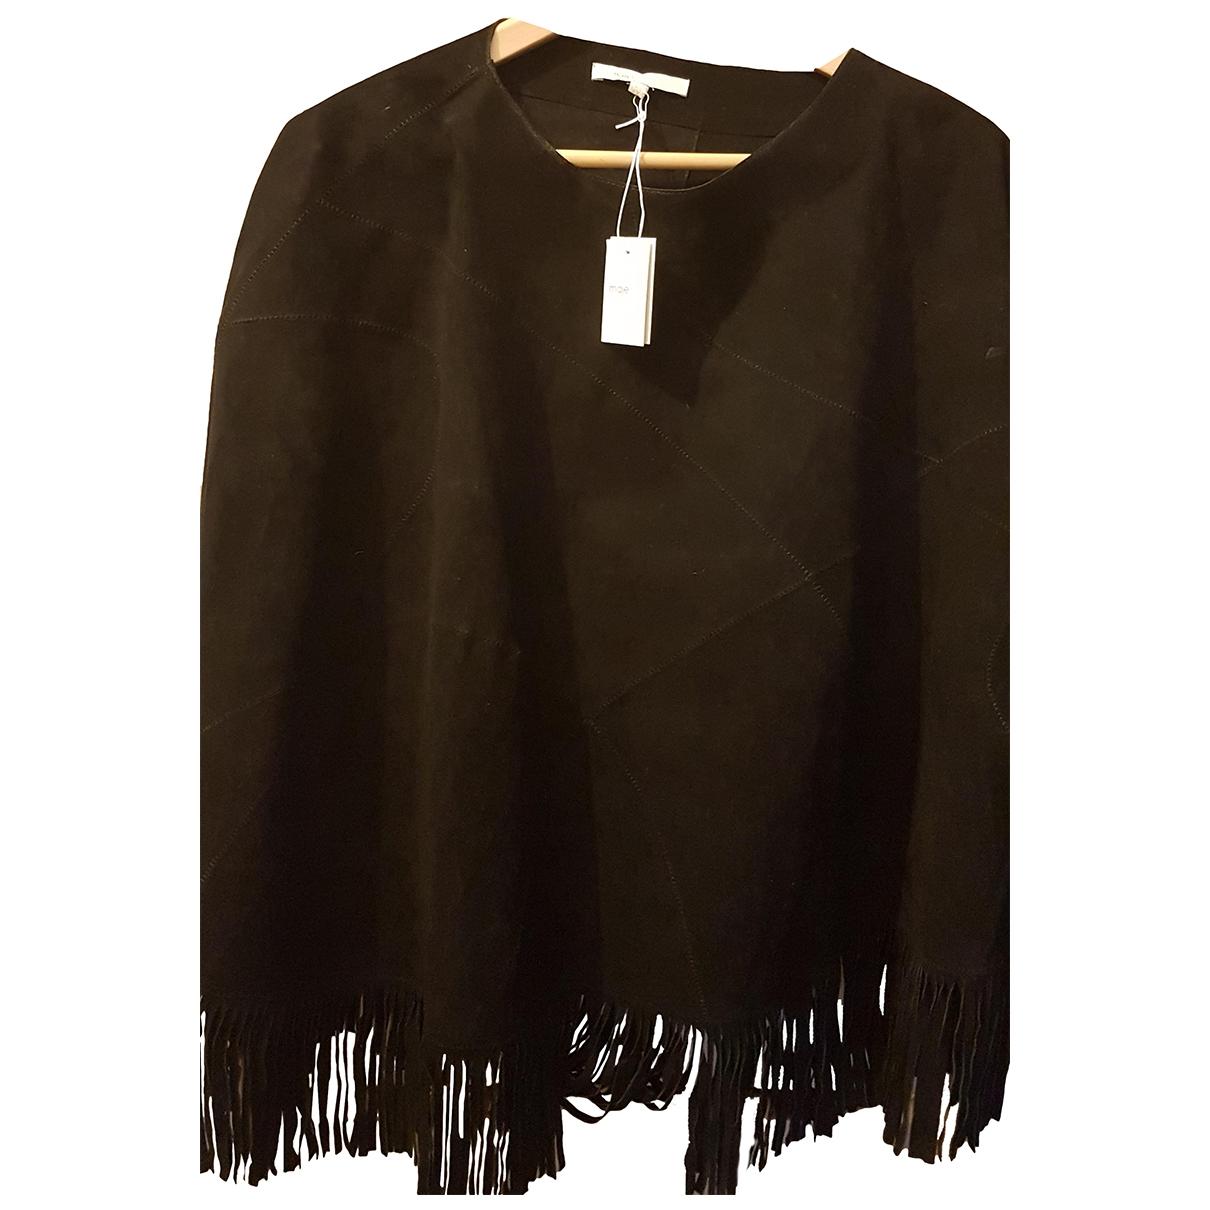 Maje \N Black Leather jacket for Women One Size FR